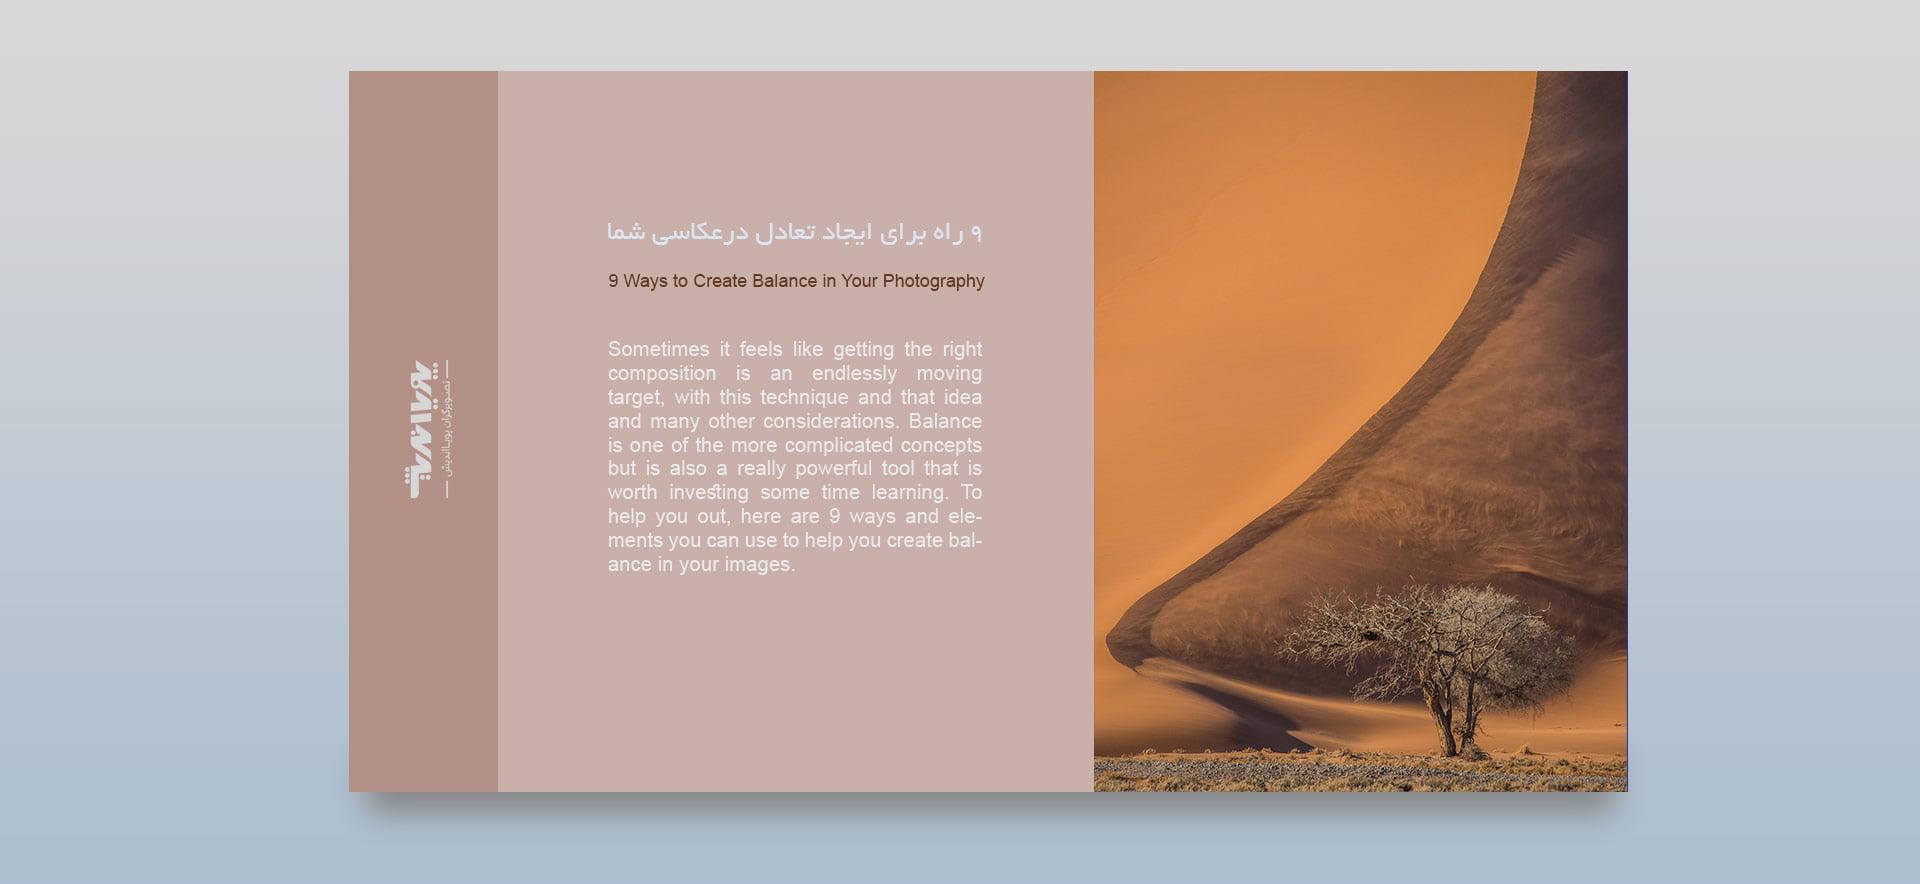 balance in photography - تعادل در عکاسی